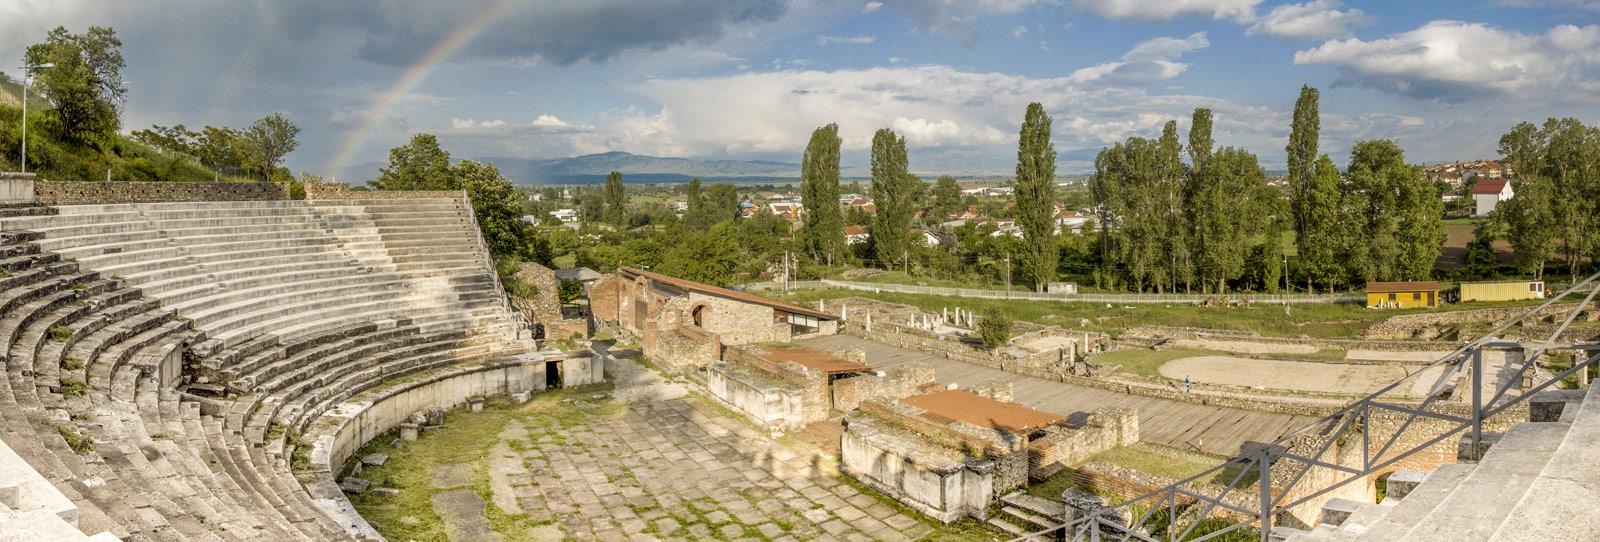 Археолошки локалитет ХЕРАКЛЕА ЛИНКЕСТИС